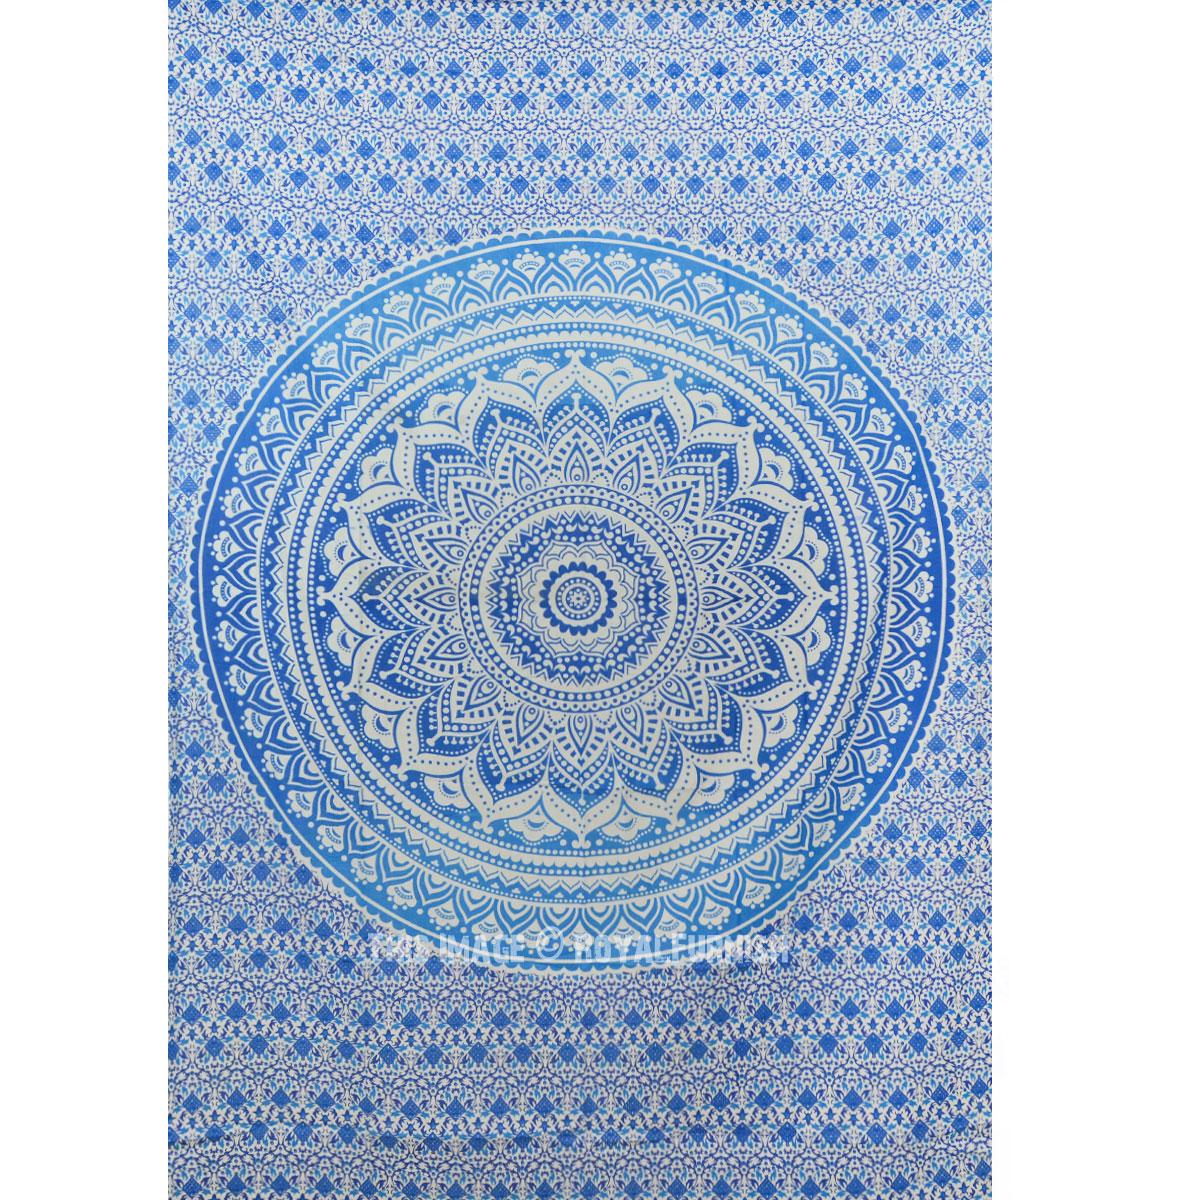 Blue multi elephants sun ombre mandala wall tapestry royalfurnish - Small Blue Goddess Ombre Mandala Tapestry Floral Wall Hanging Bedspread Royalfurnish Com